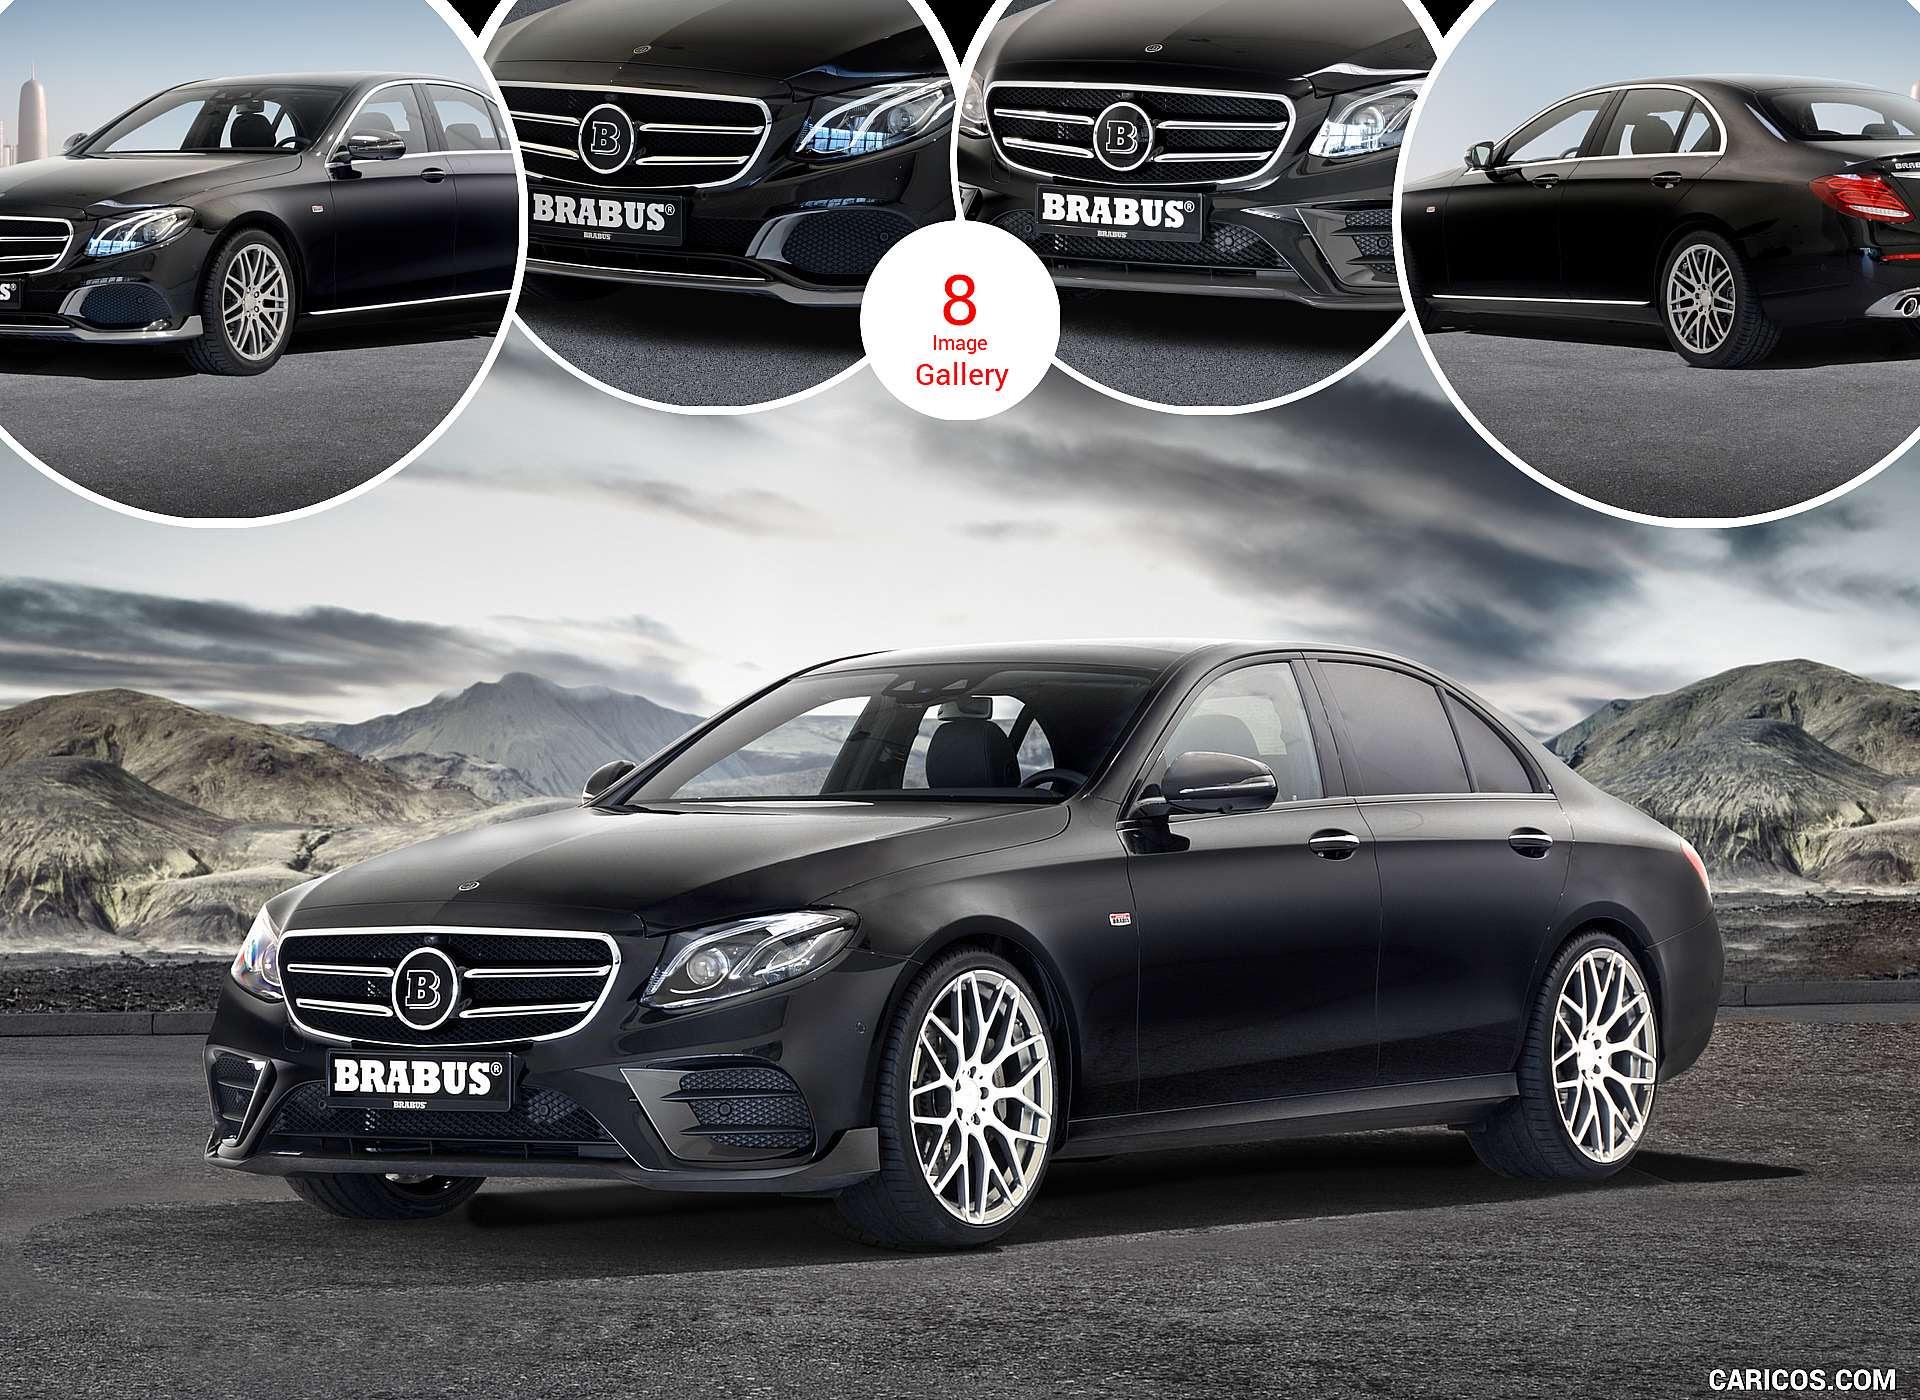 2017 BRABUS MercedesBenz EClass W 213  Caricos.com